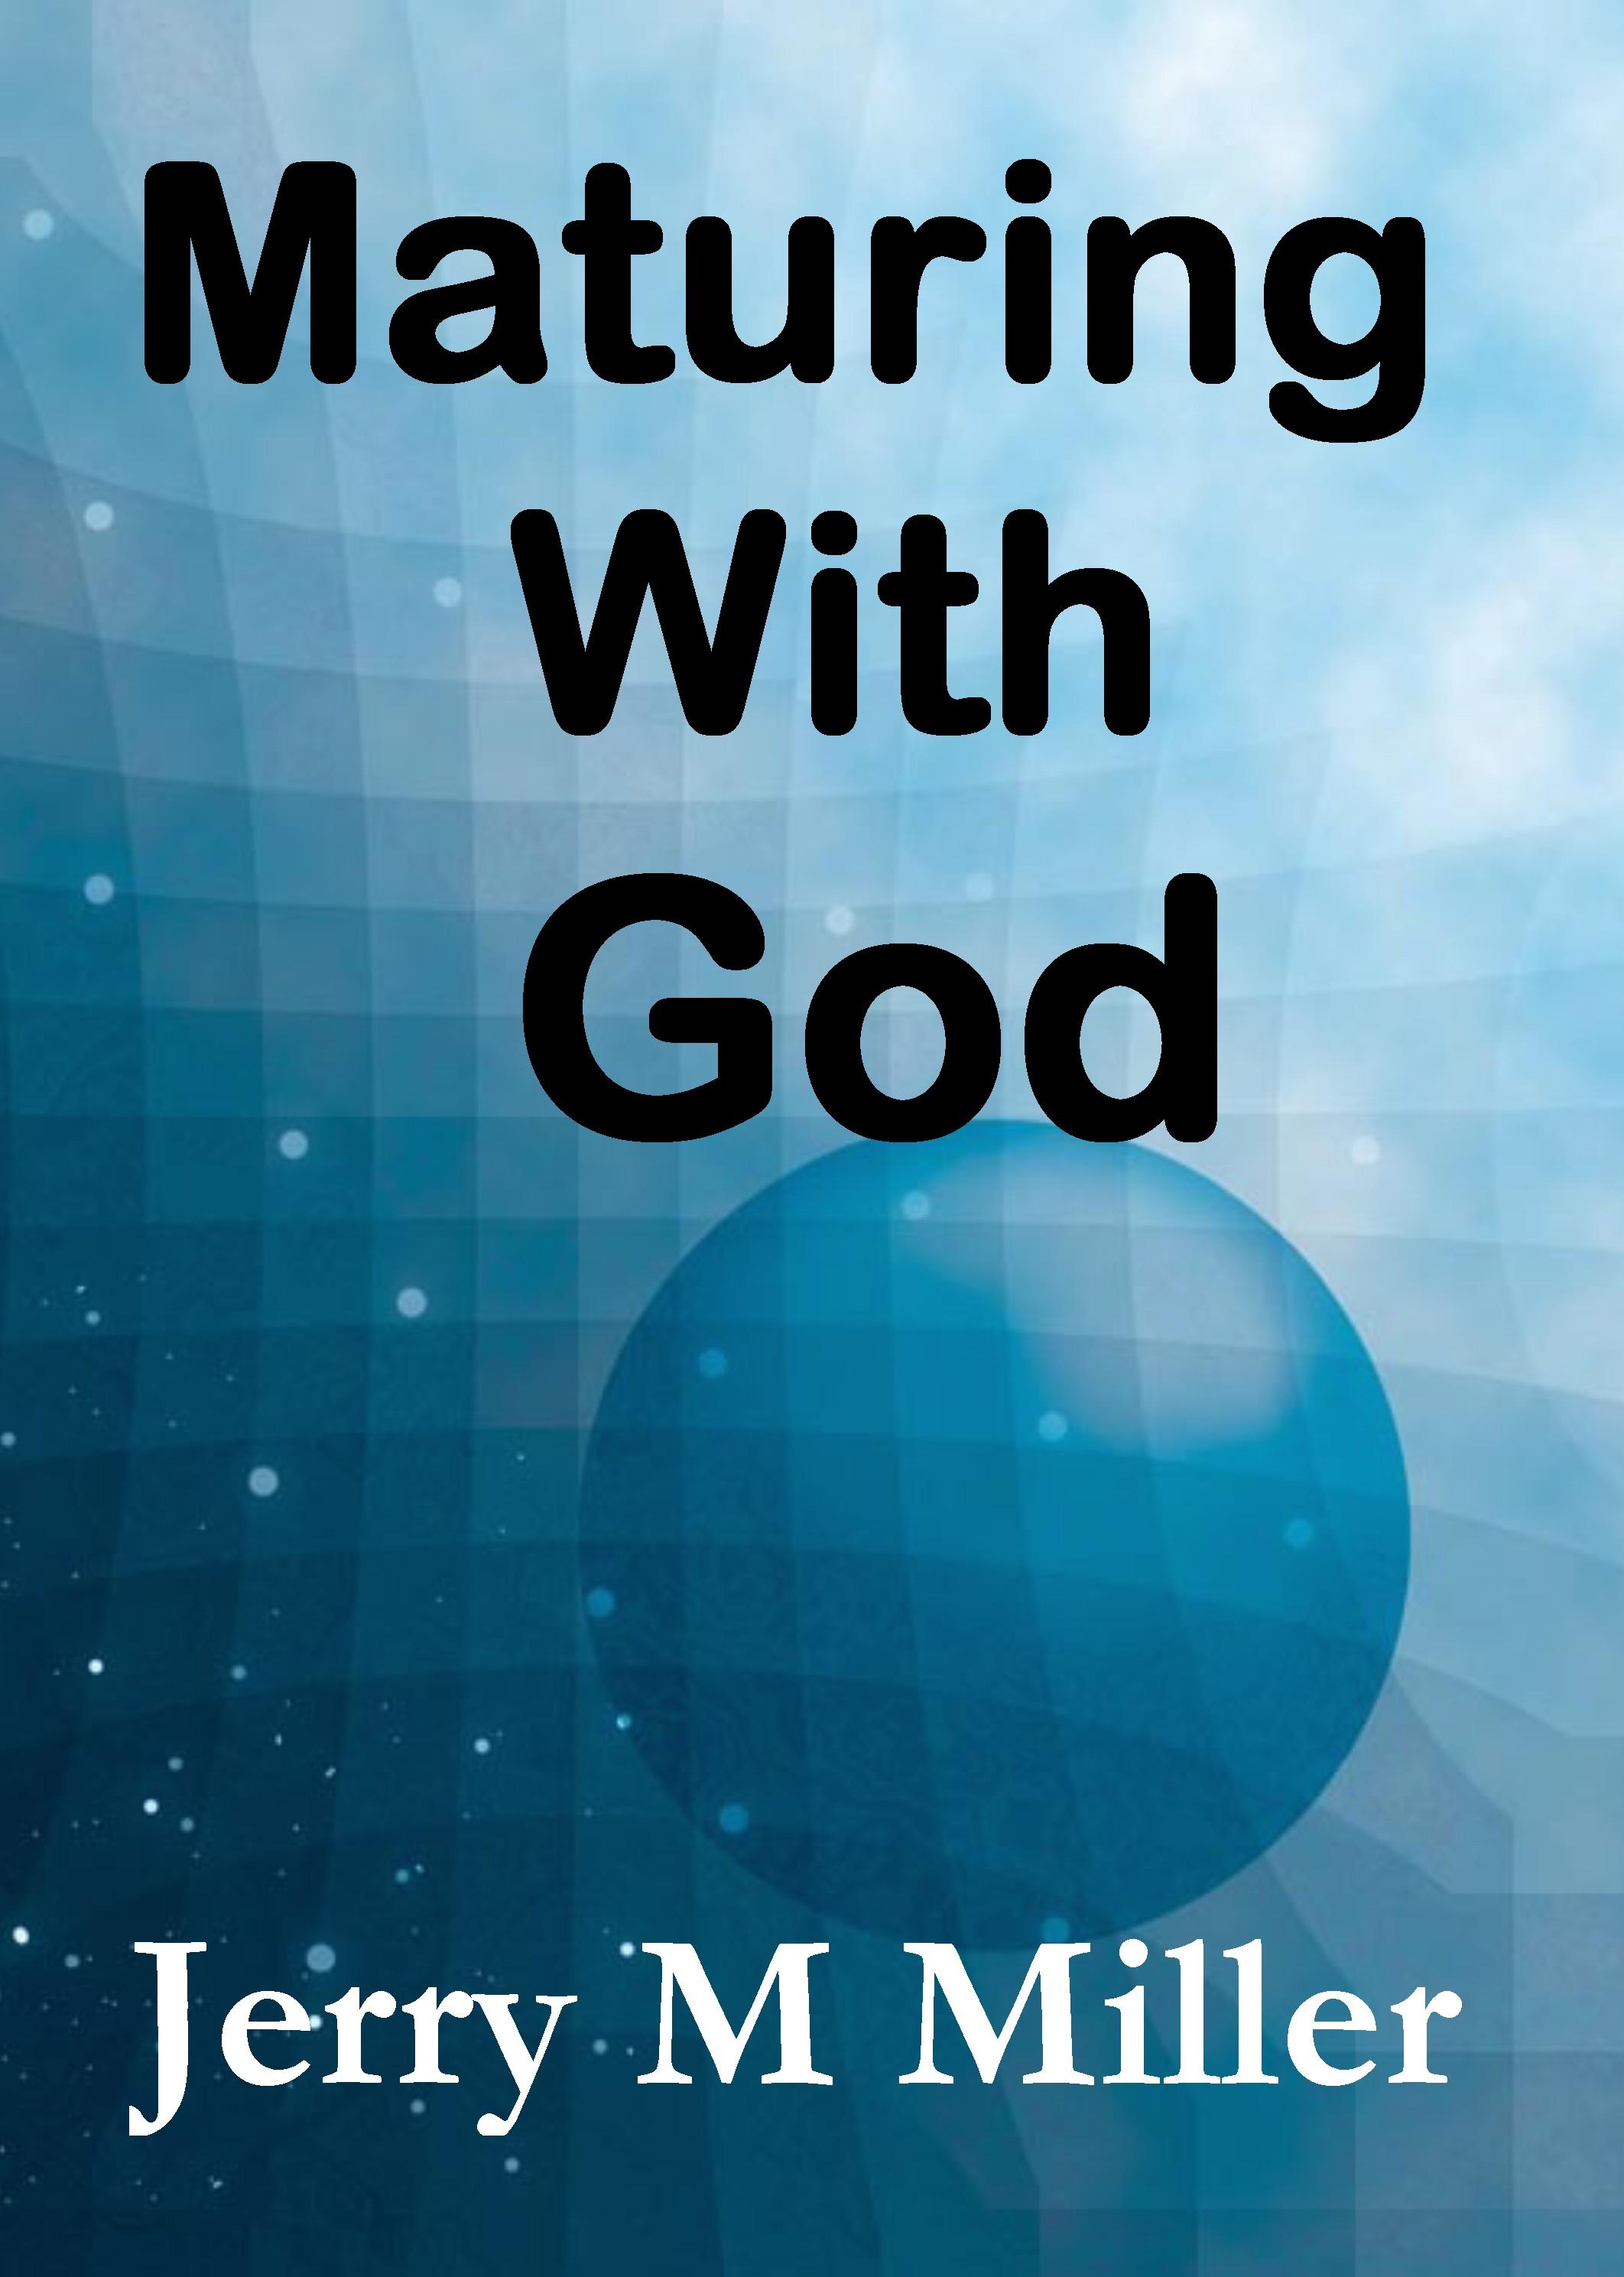 Maturing with God